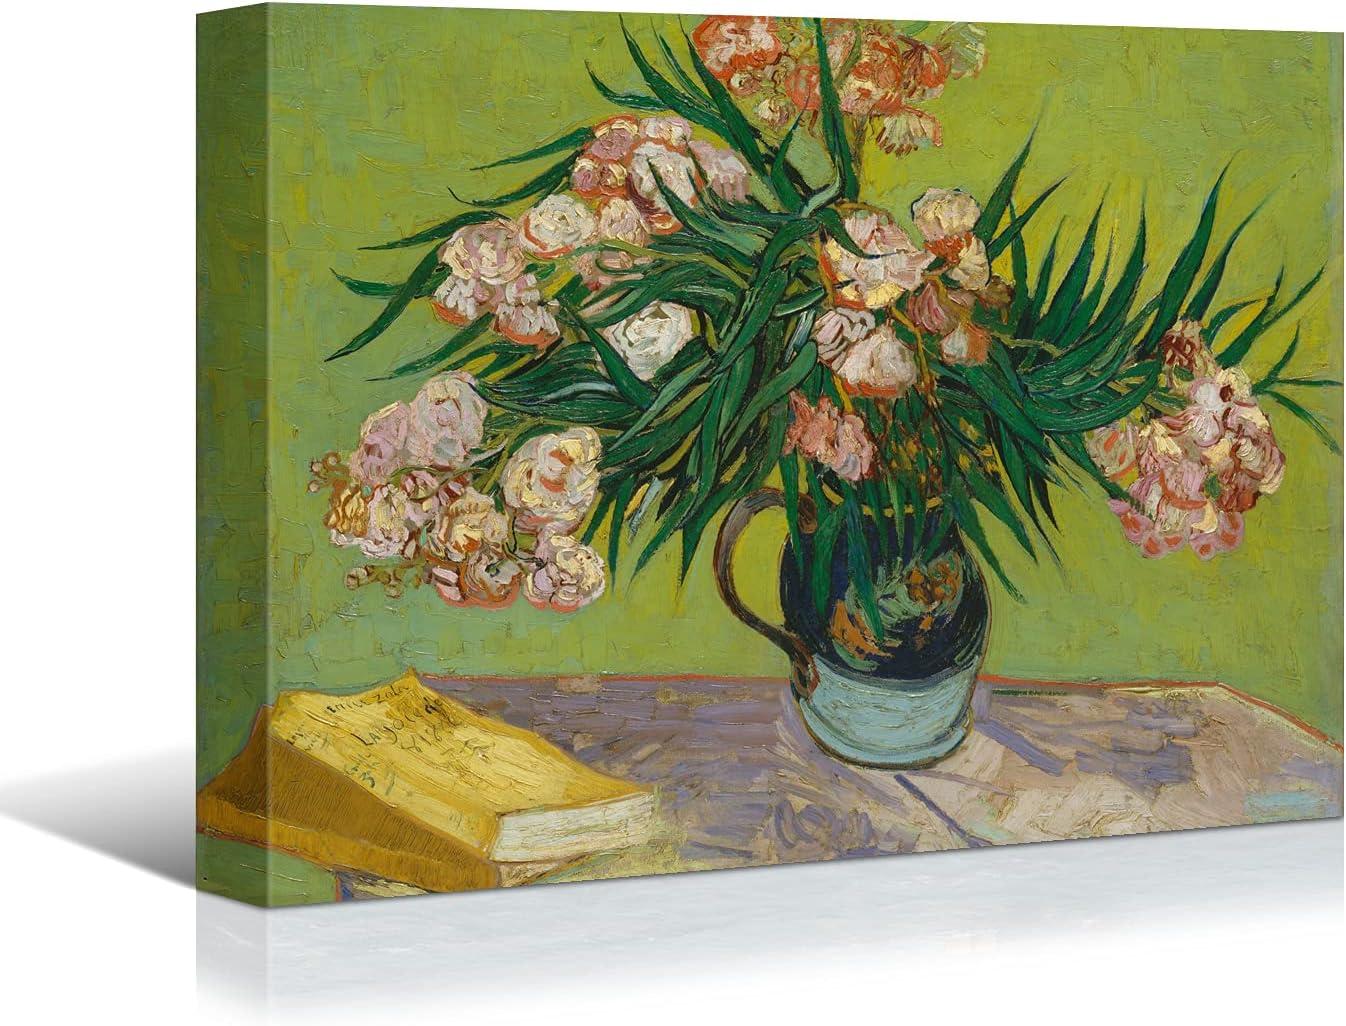 Looife Van Gogh Canvas Wall Art Decor Flower 36x24 Inch on New Shipping Free Tabl Kansas City Mall